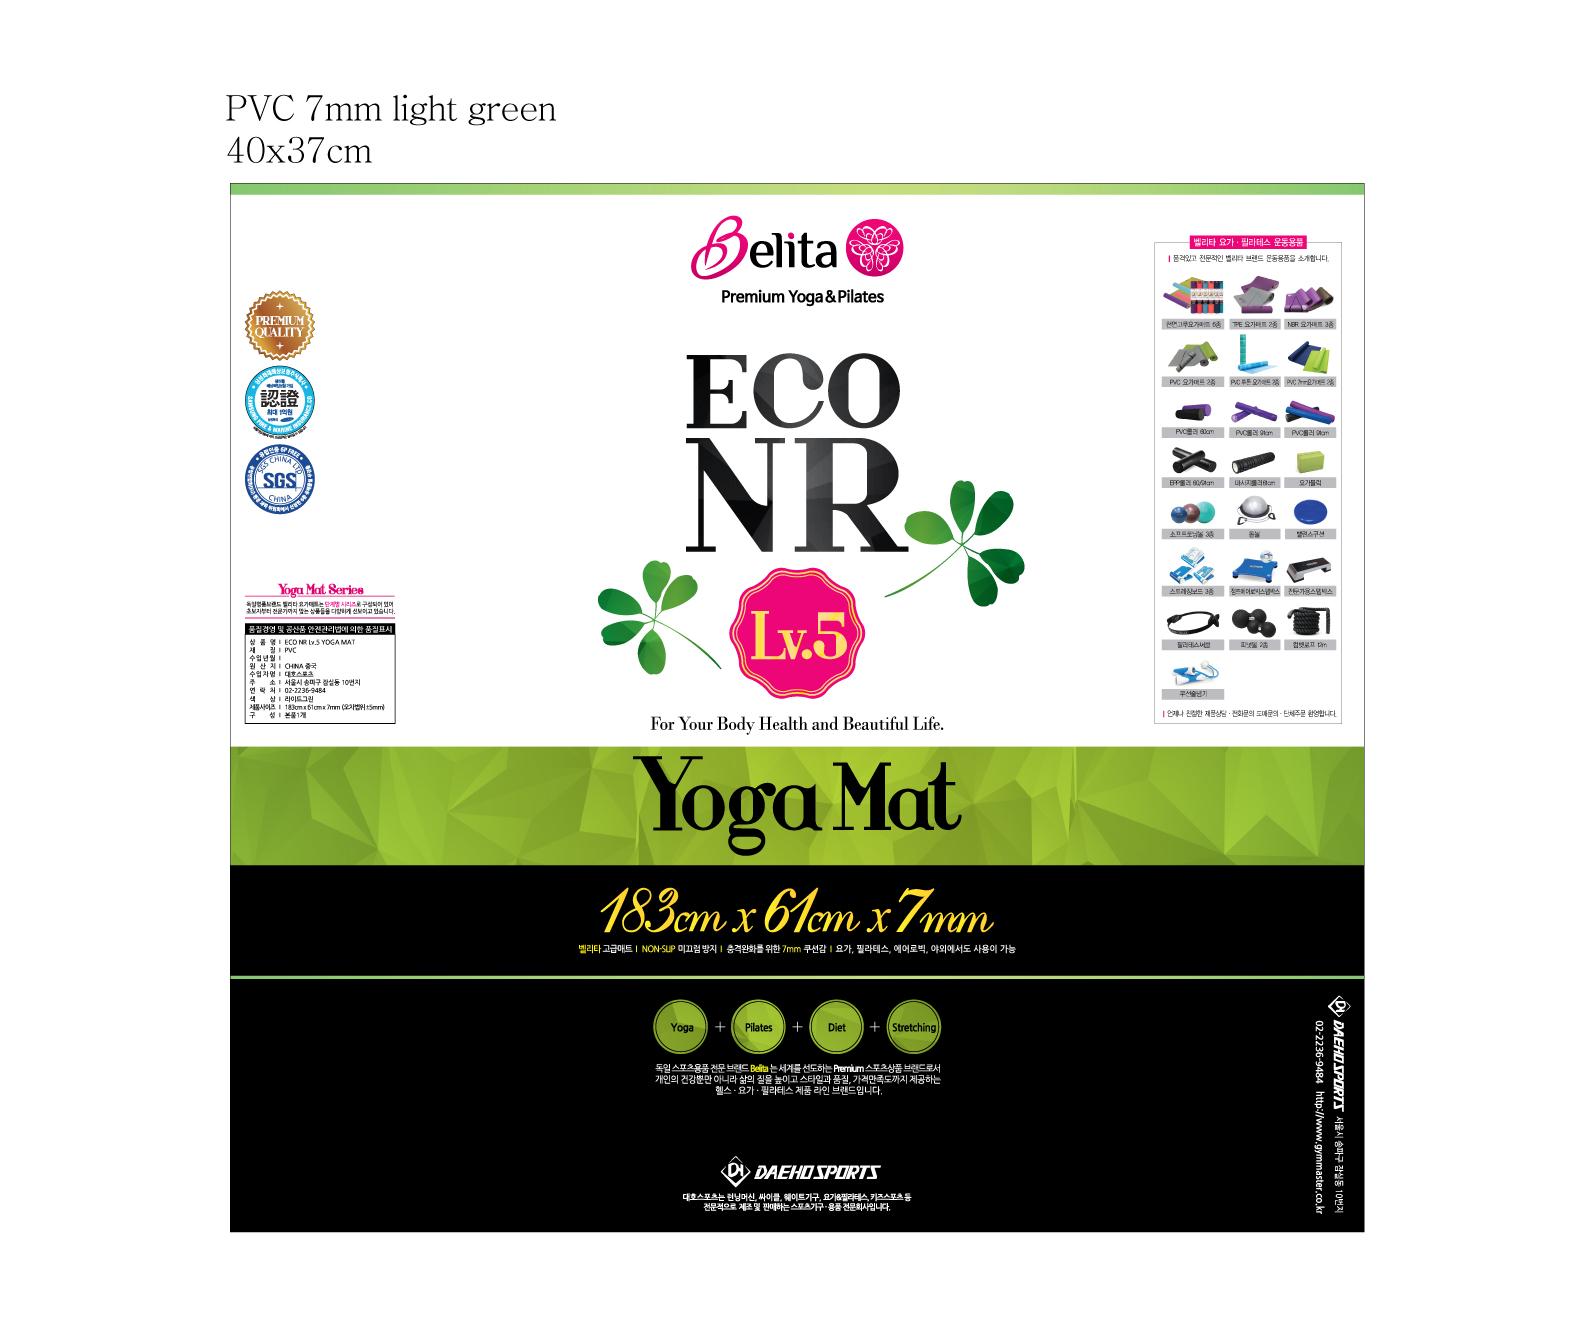 eco nr lv5 yoga mat 라이트그린 7mm